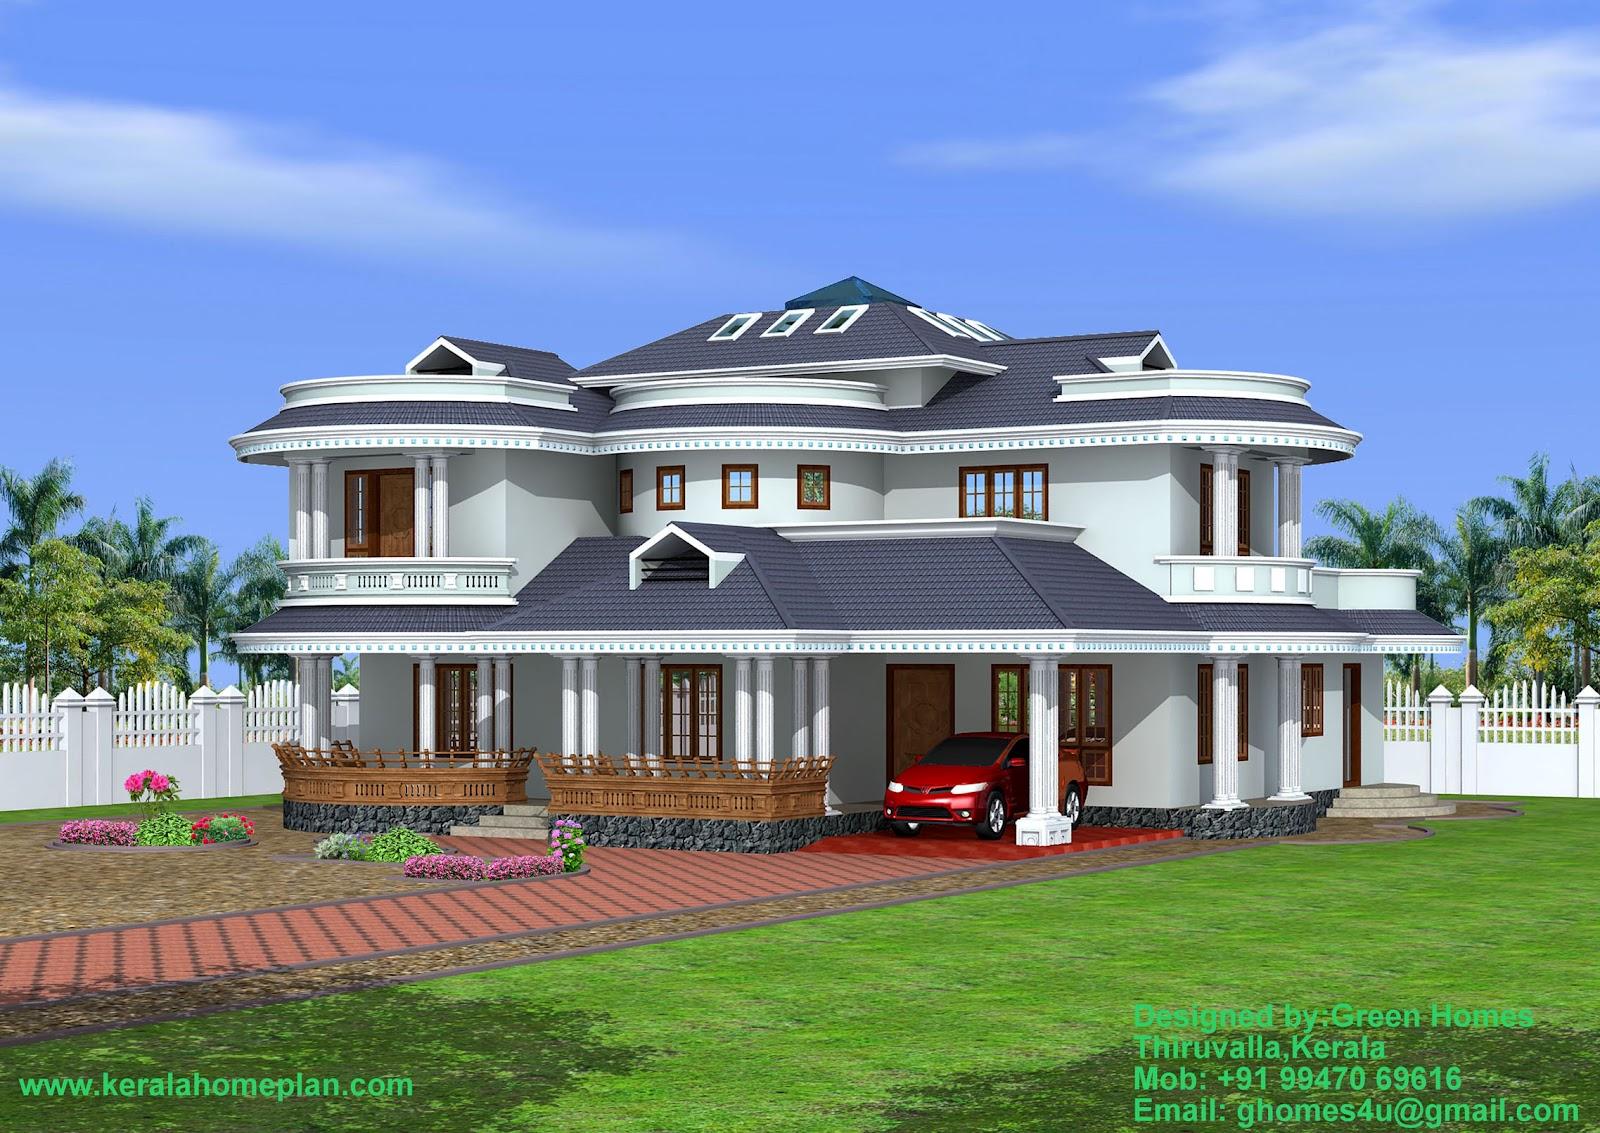 Green homes construction beautiful 4 bedroom kerala home for Kerala house exterior